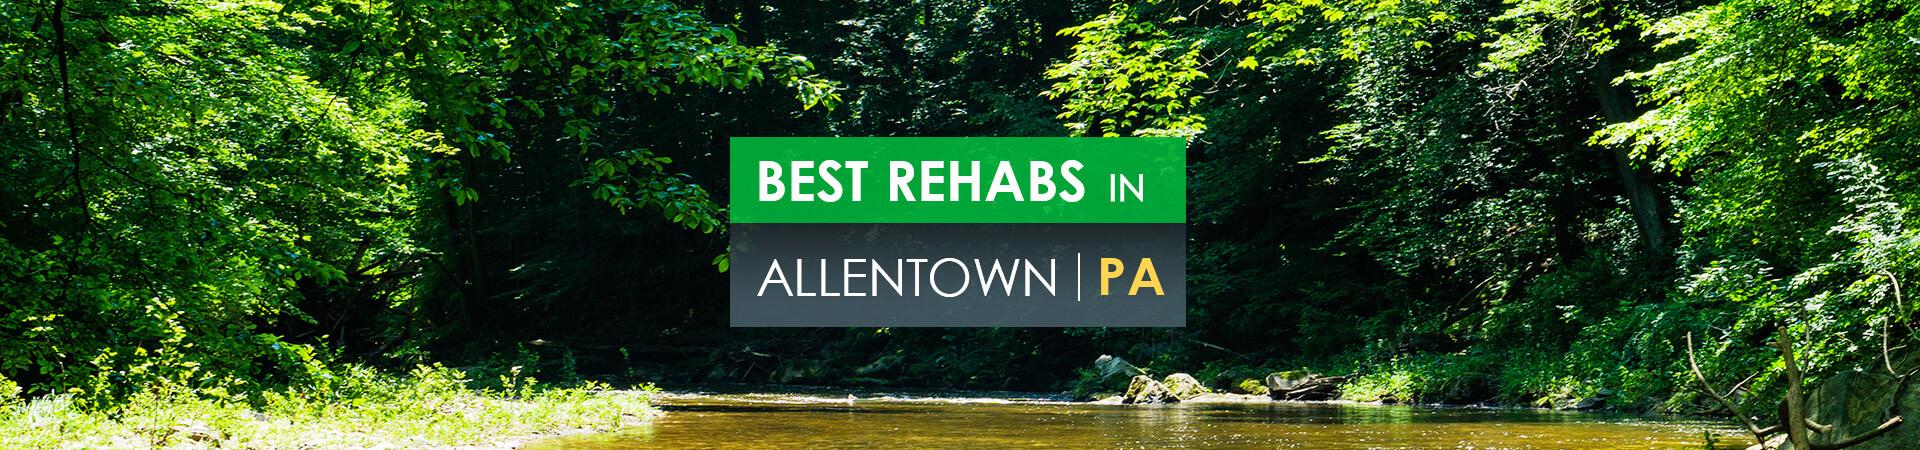 Best rehabs in Allentown, PA